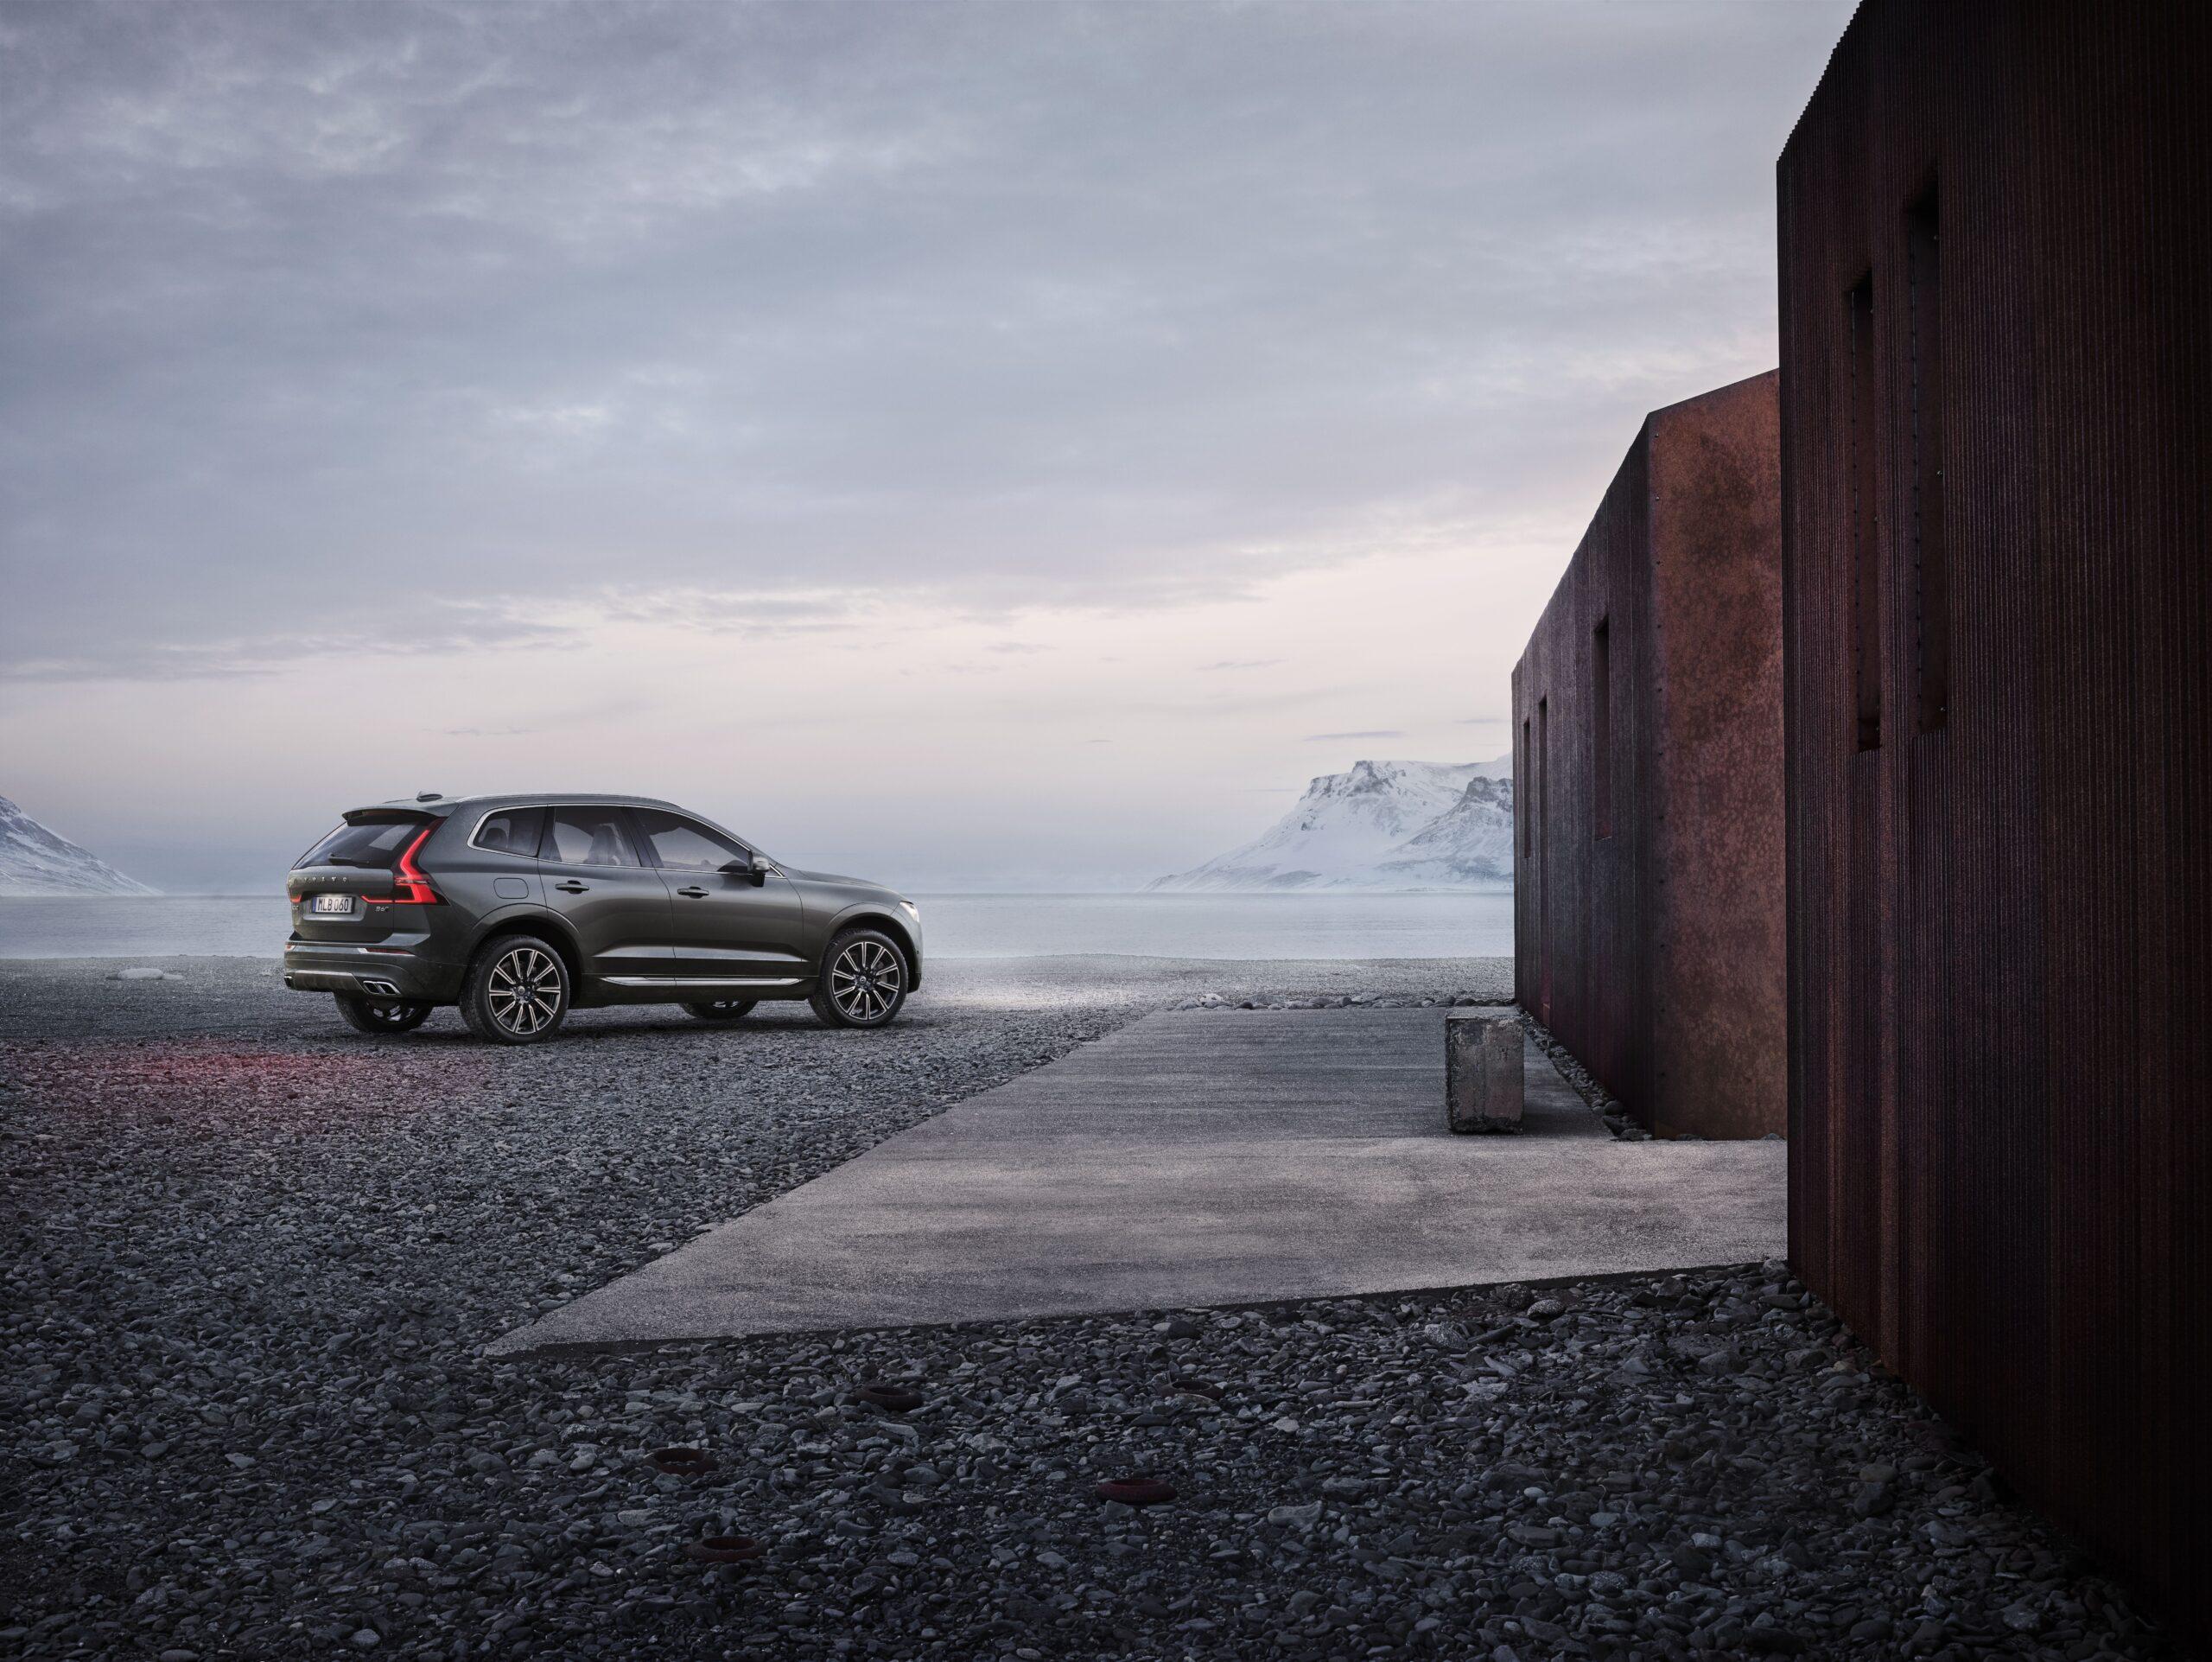 Volvo ХС60 ua фото экстерьера 1